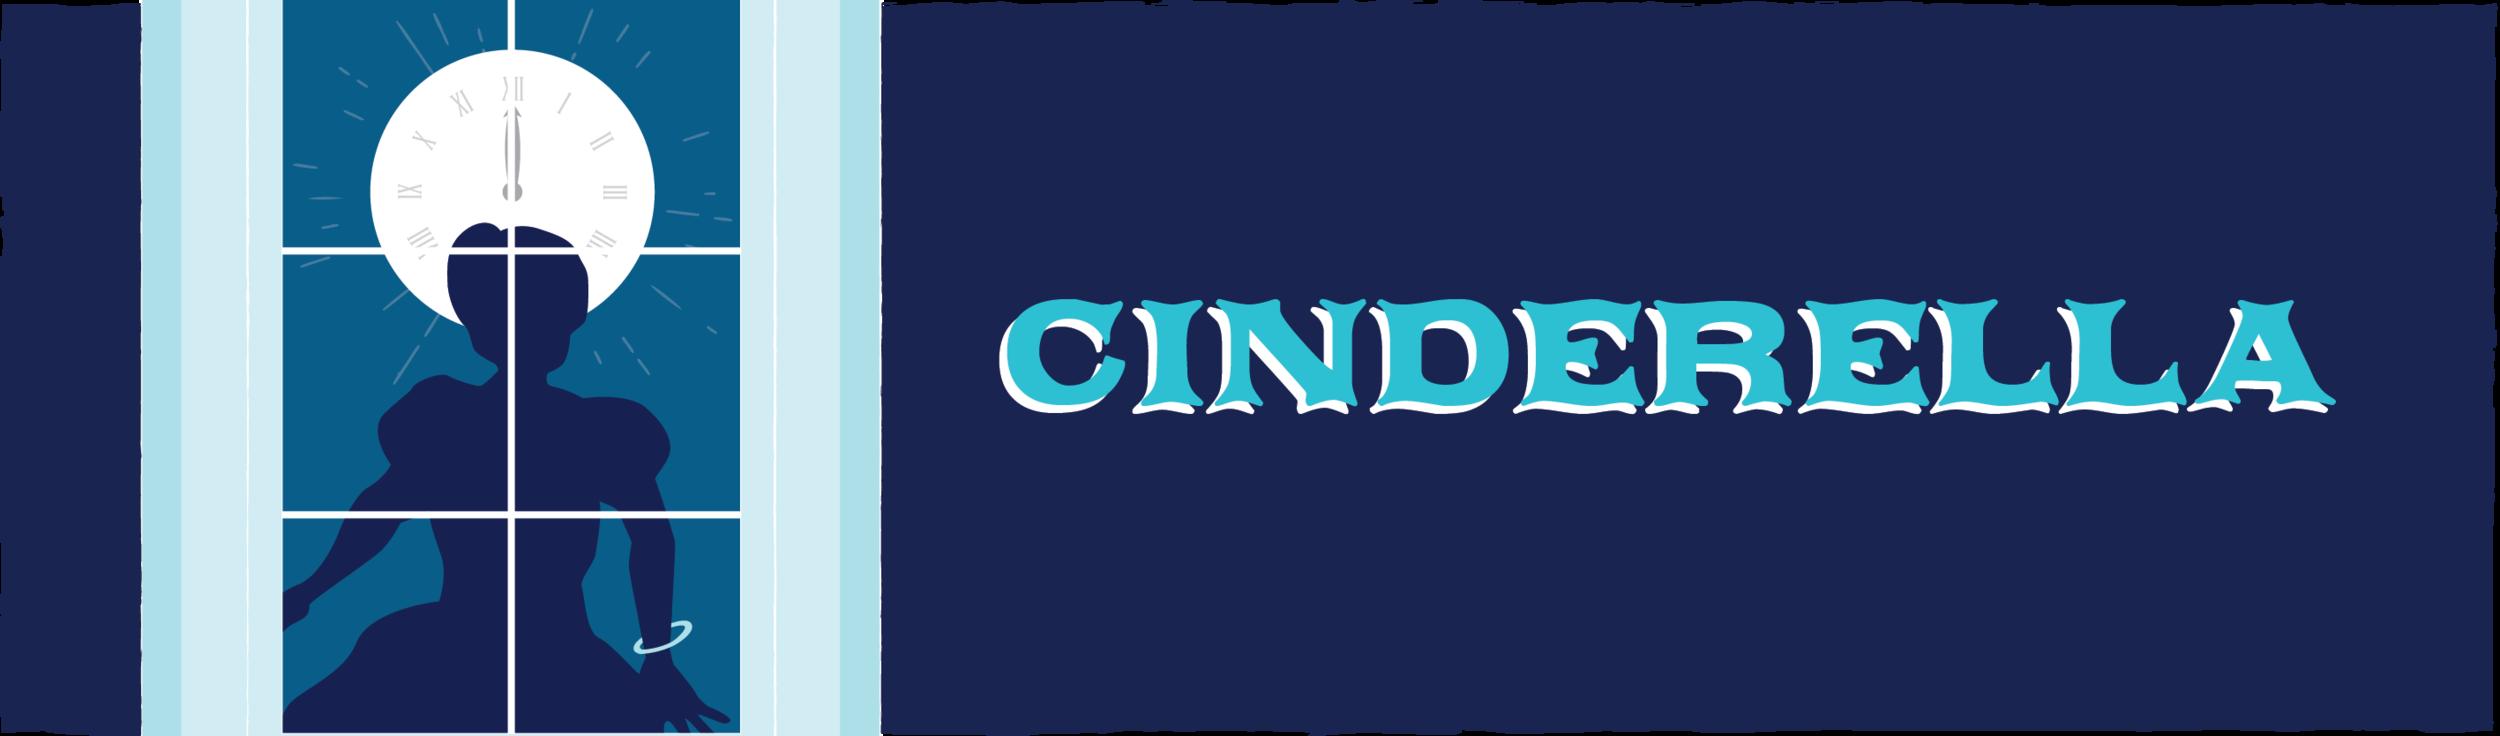 OperaOnTour_Cinderella.png